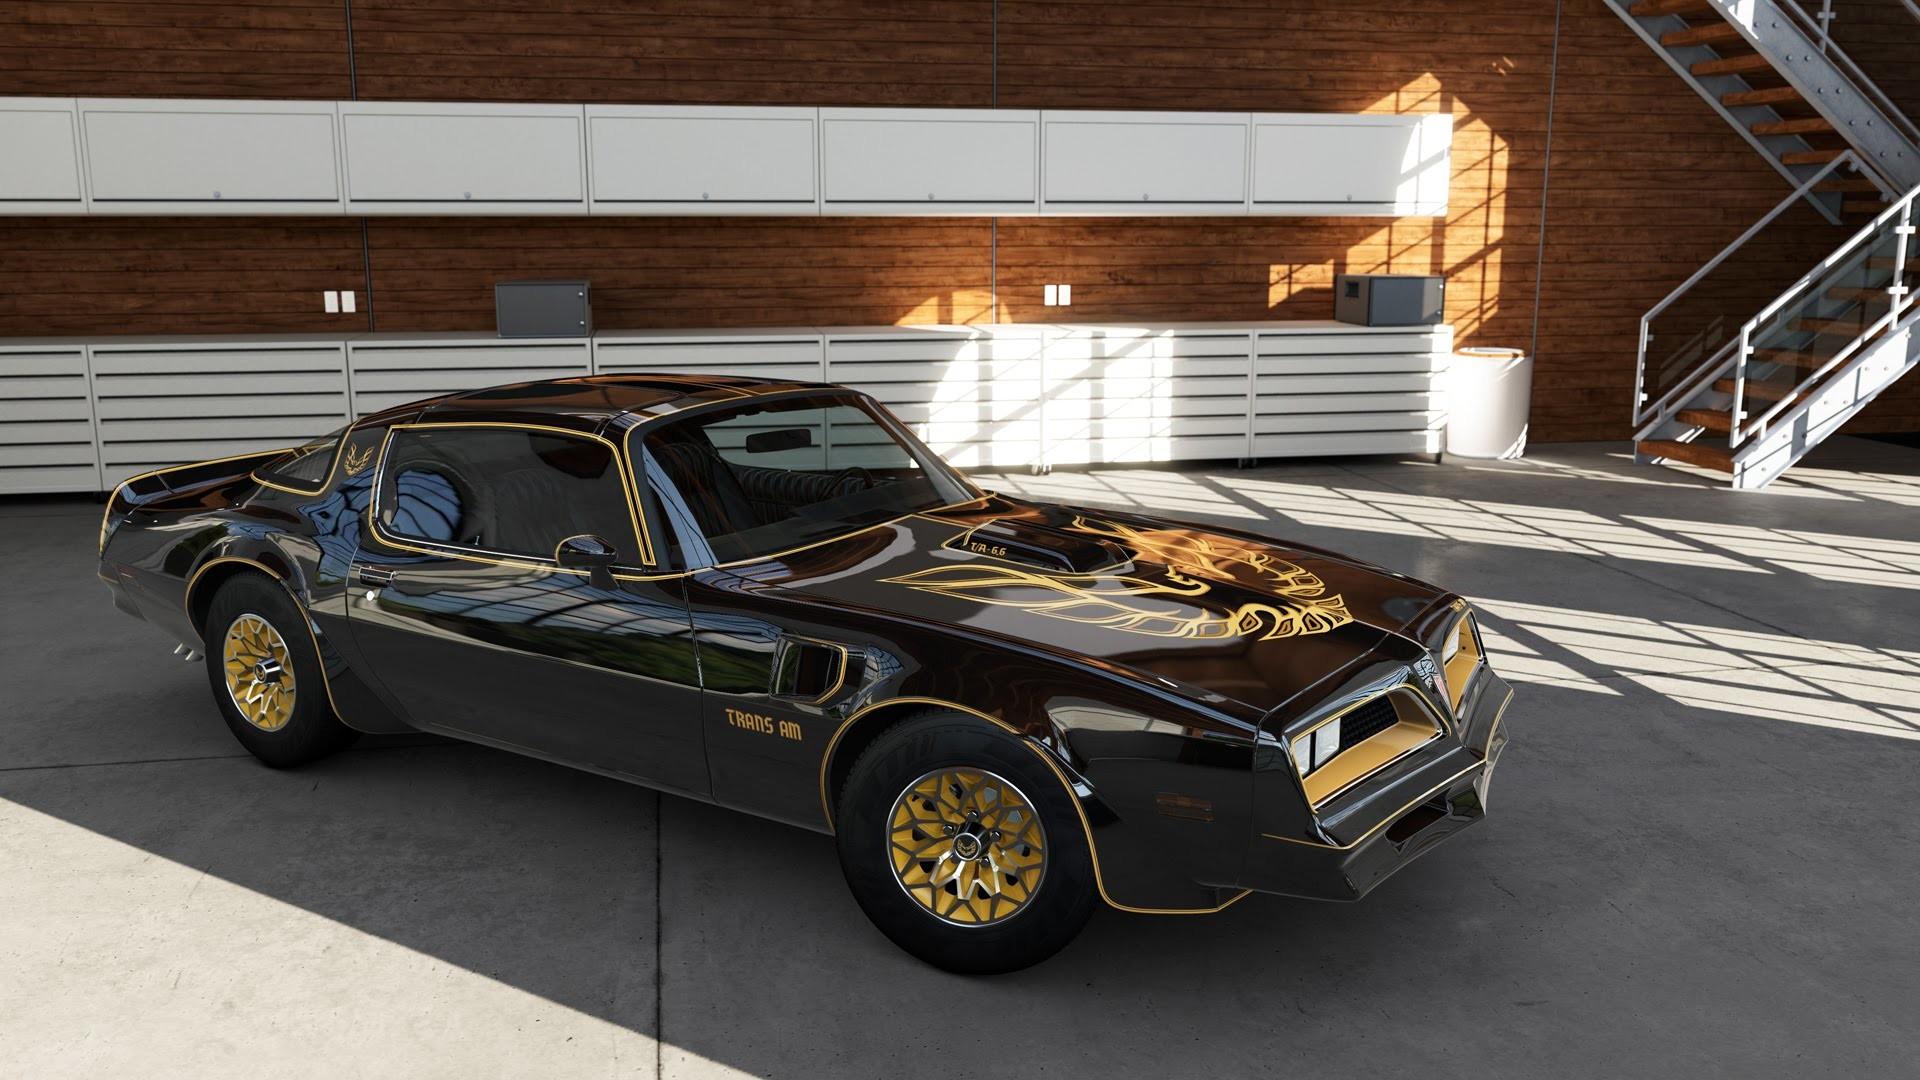 Res: 1920x1080, Forza 5 1977 Pontiac Firebird Trans Am at Road Atlanta Club (Autovista/Test  Drive)